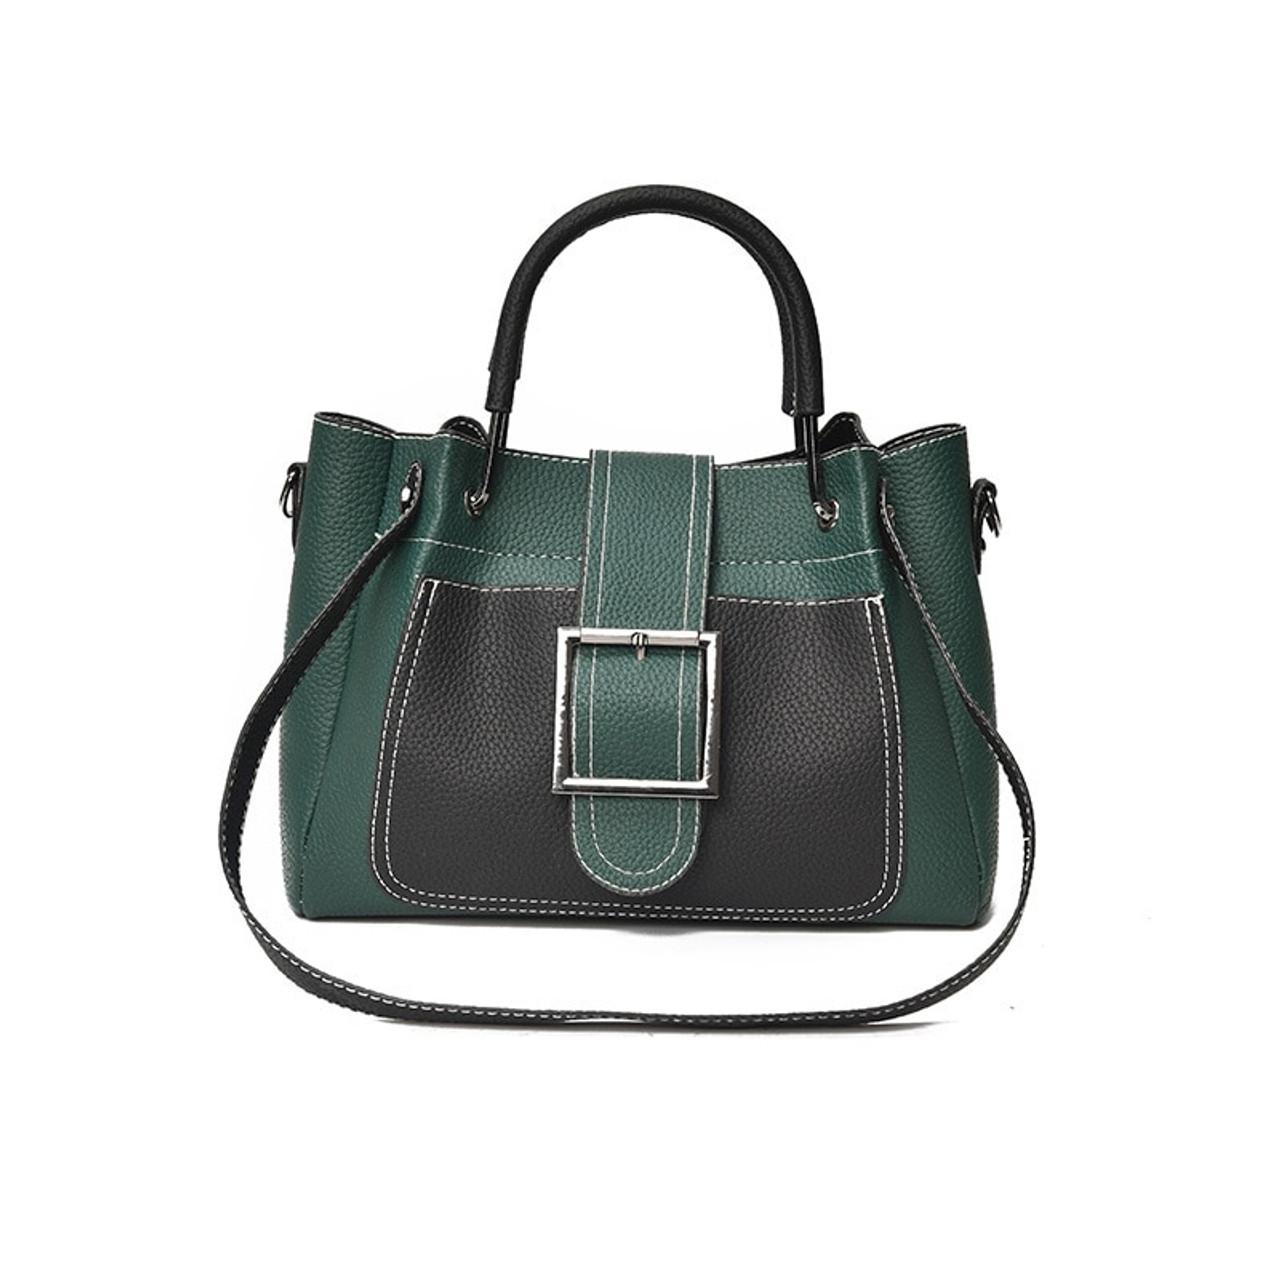 99b04236ff02 LANLOU Luxury Handbags Women Shoulder Bag Large Tote Bags Hobo Soft Leather  Ladies Crossbody Messenger Bag for Women Sac a Main - OnshopDeals.Com